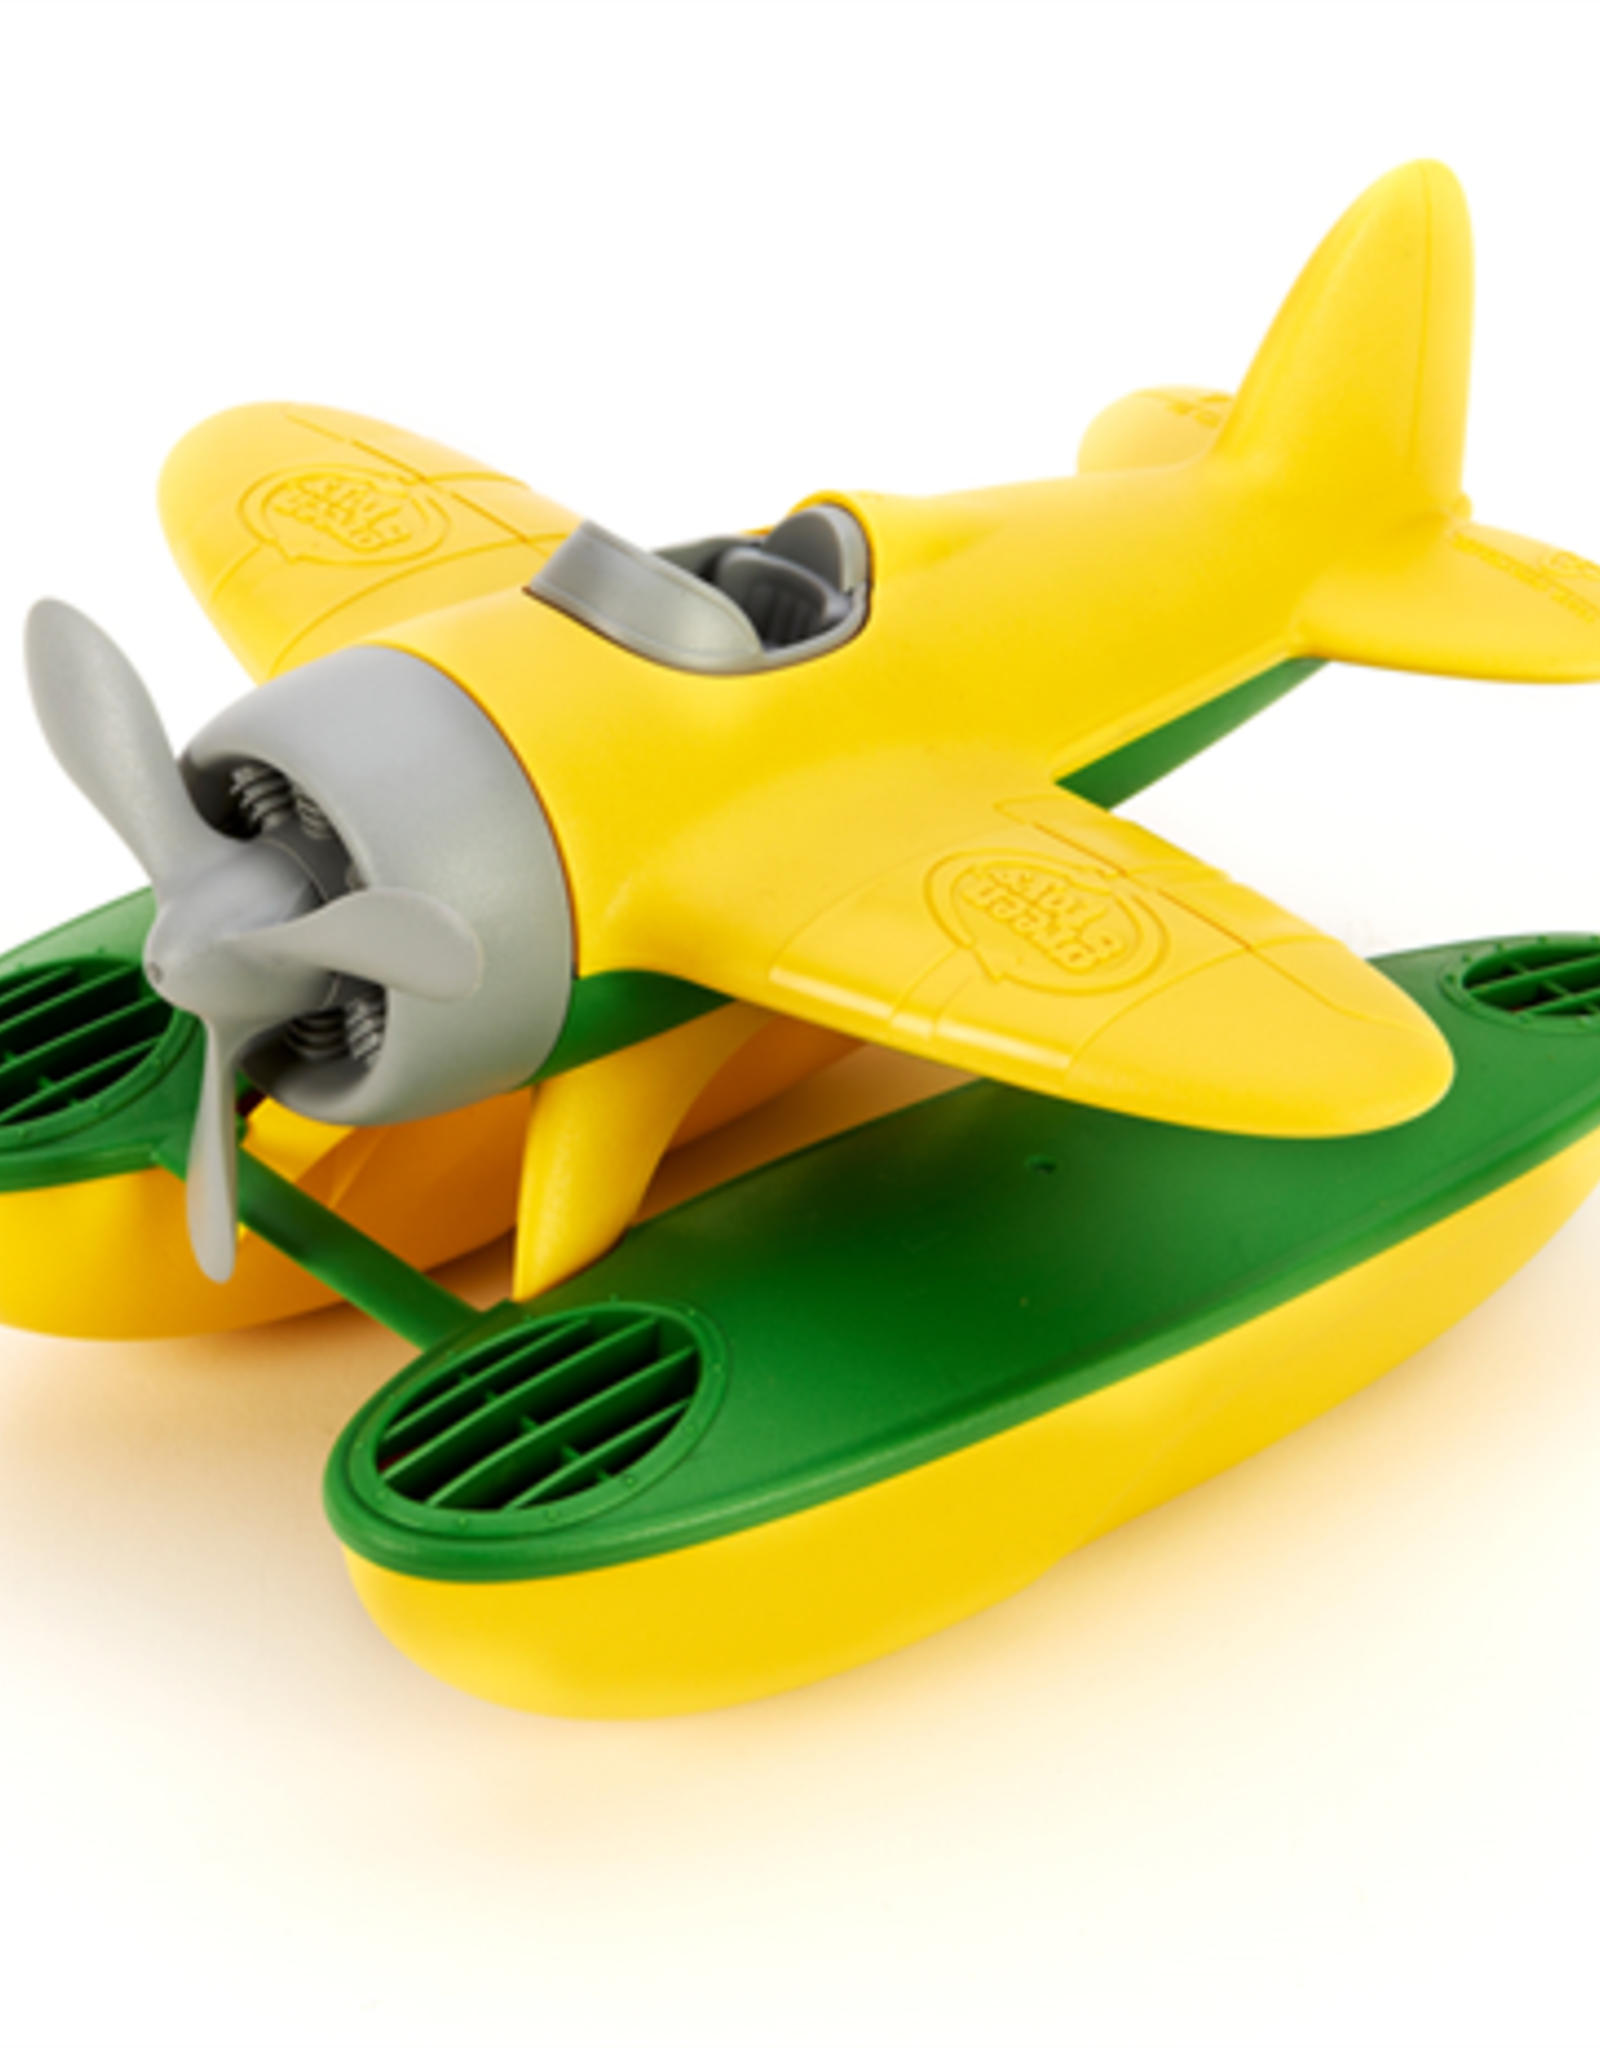 Green Toys Seaplane Geel